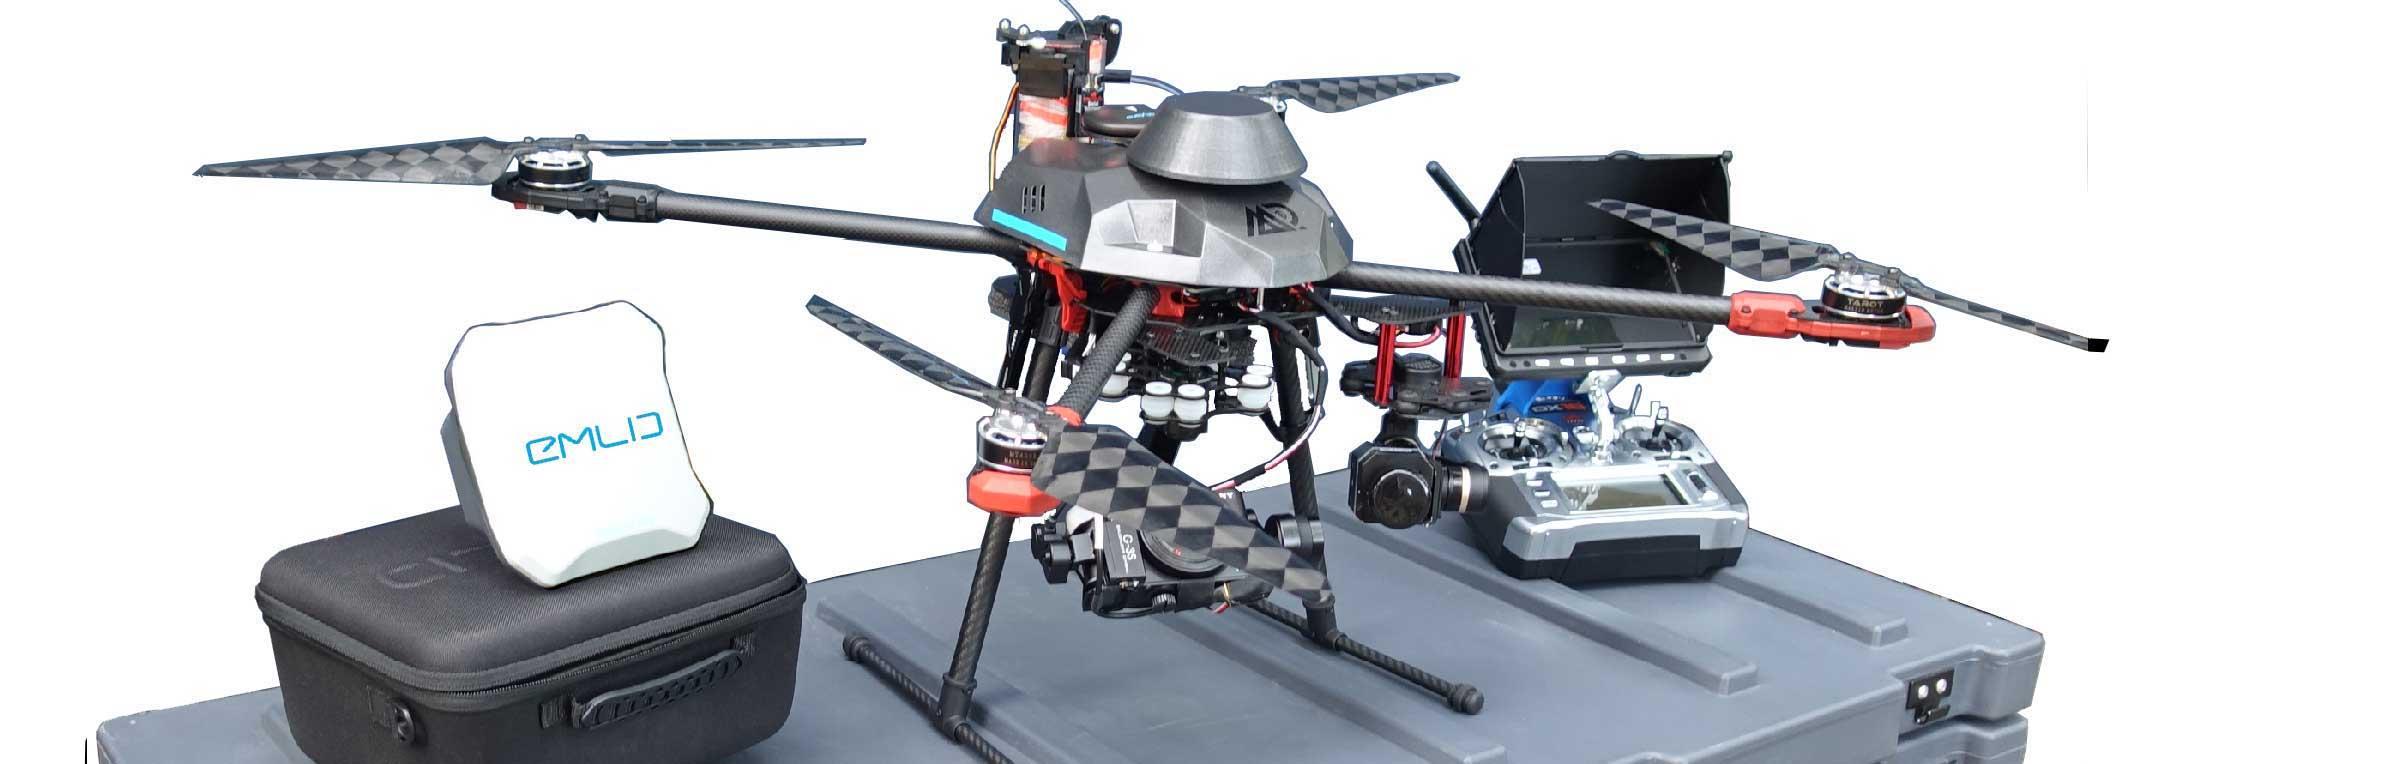 3d robotics solo 3d robotics stock 3d robotics iris 3d robotics pixhawk 3d robotics careers